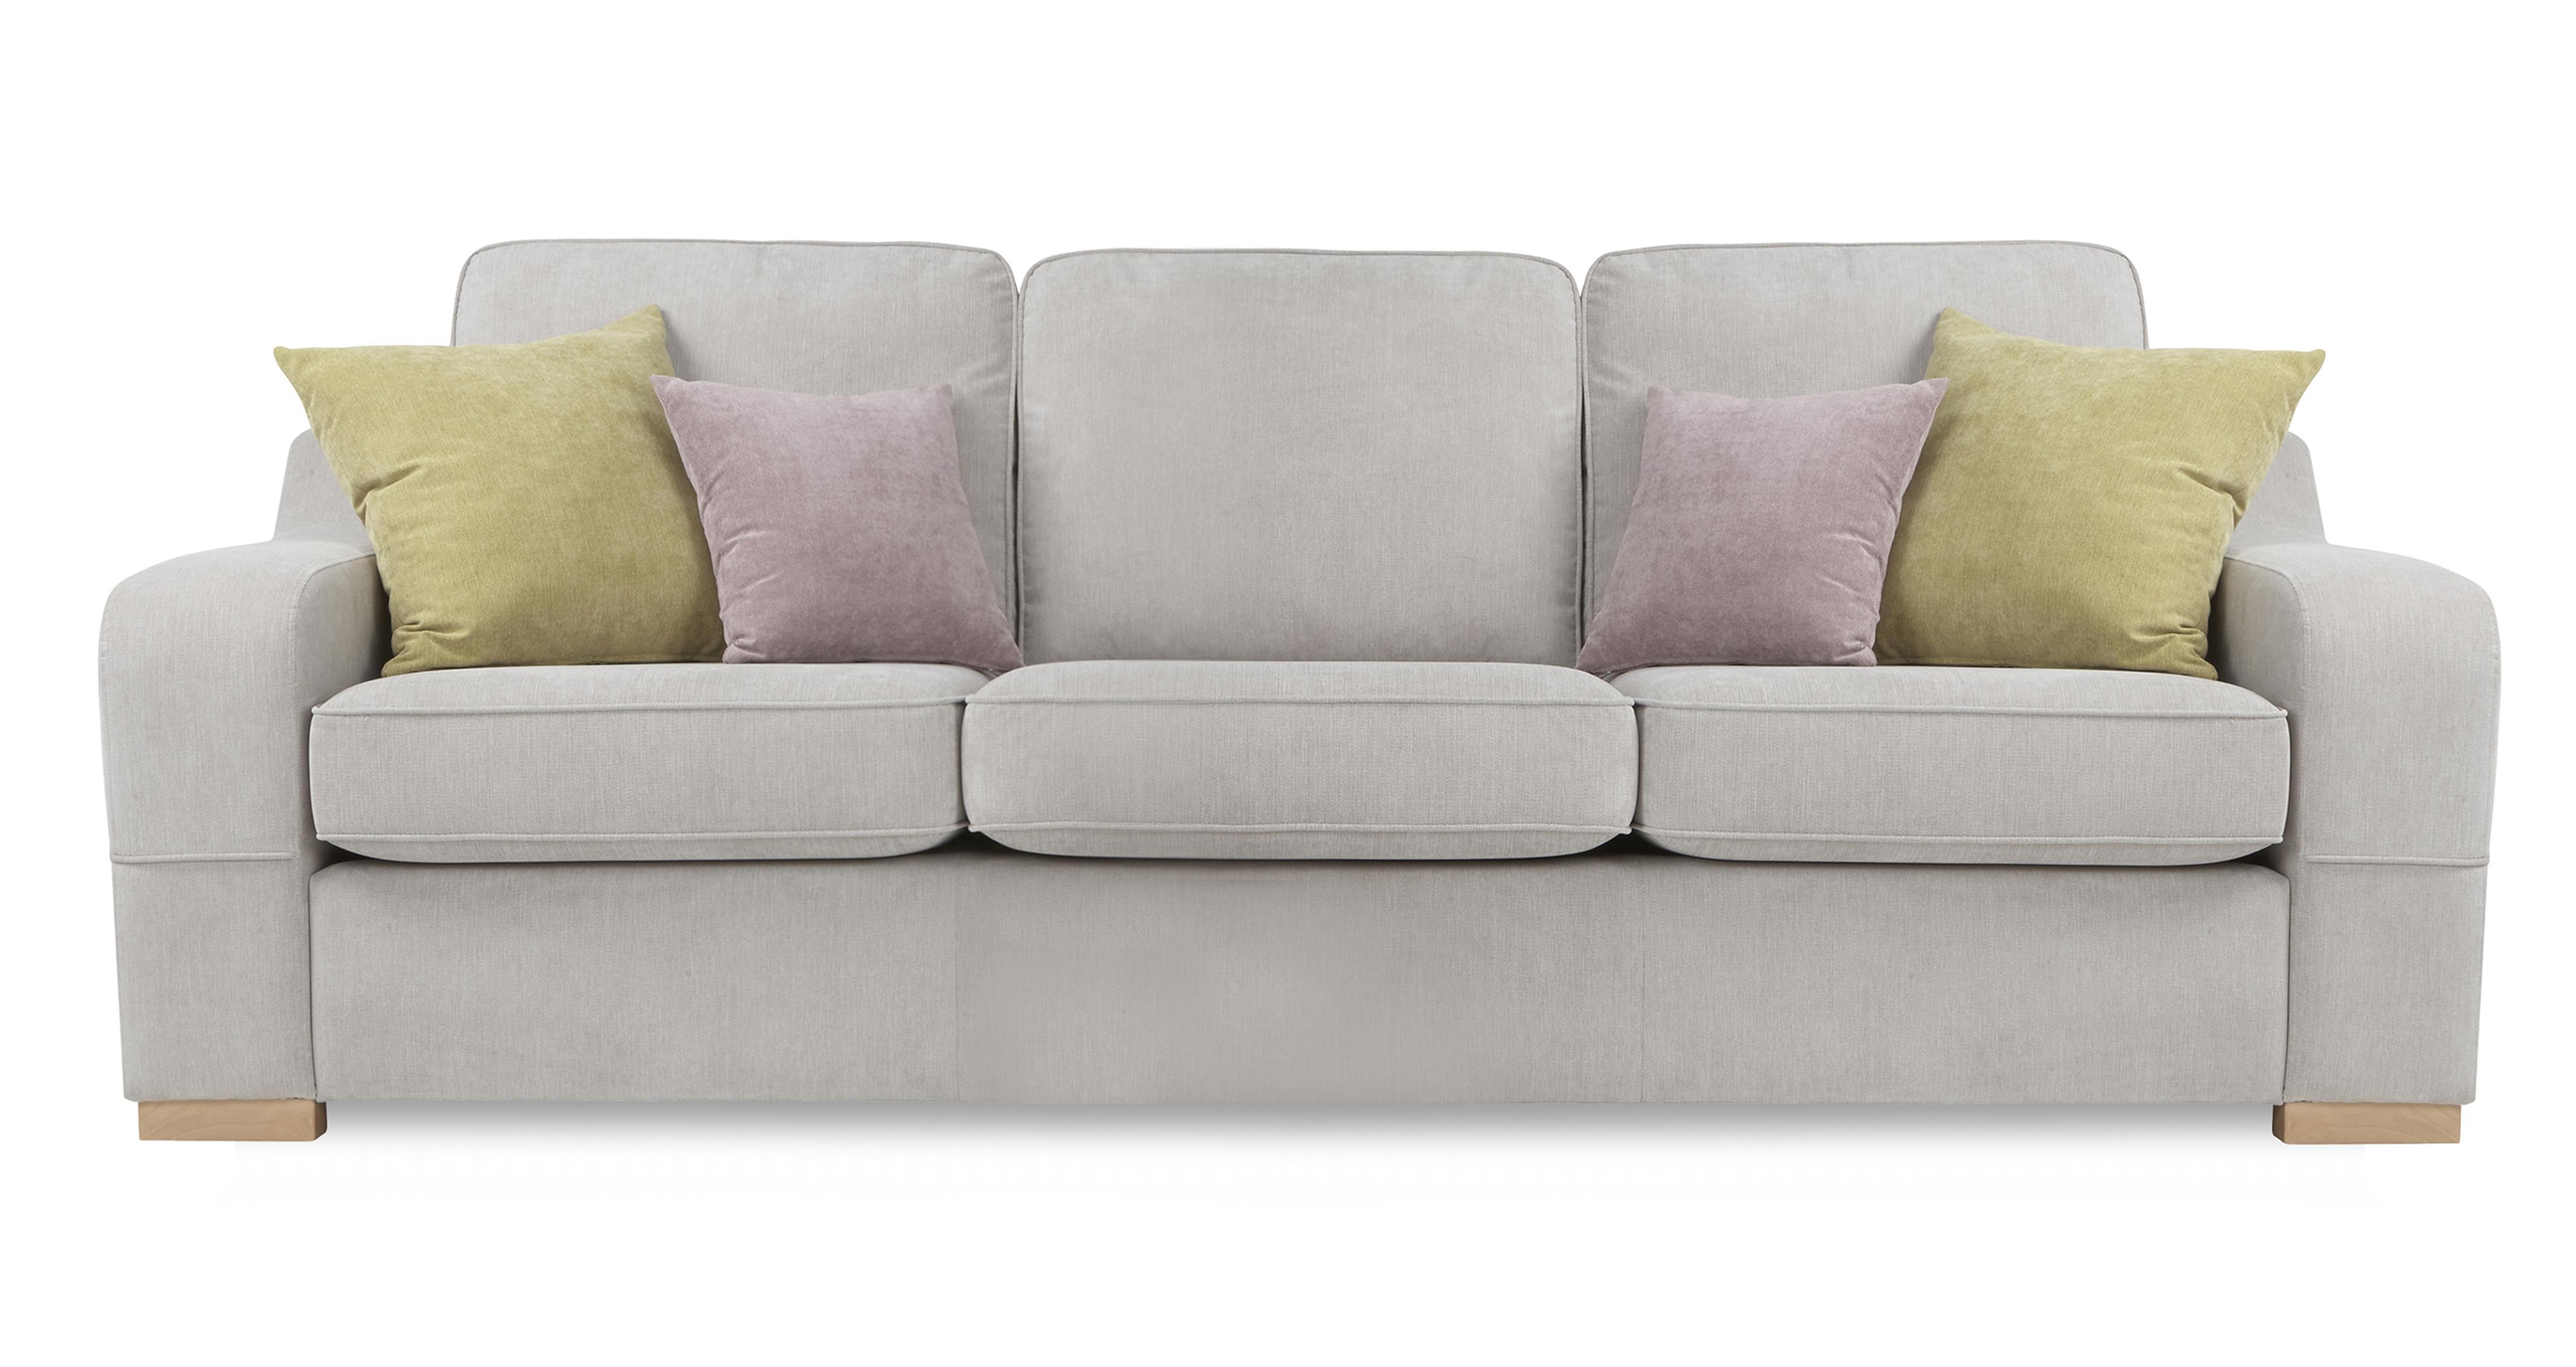 DFS Sherbet 4 Seater Fabric Silver Sofa EBay